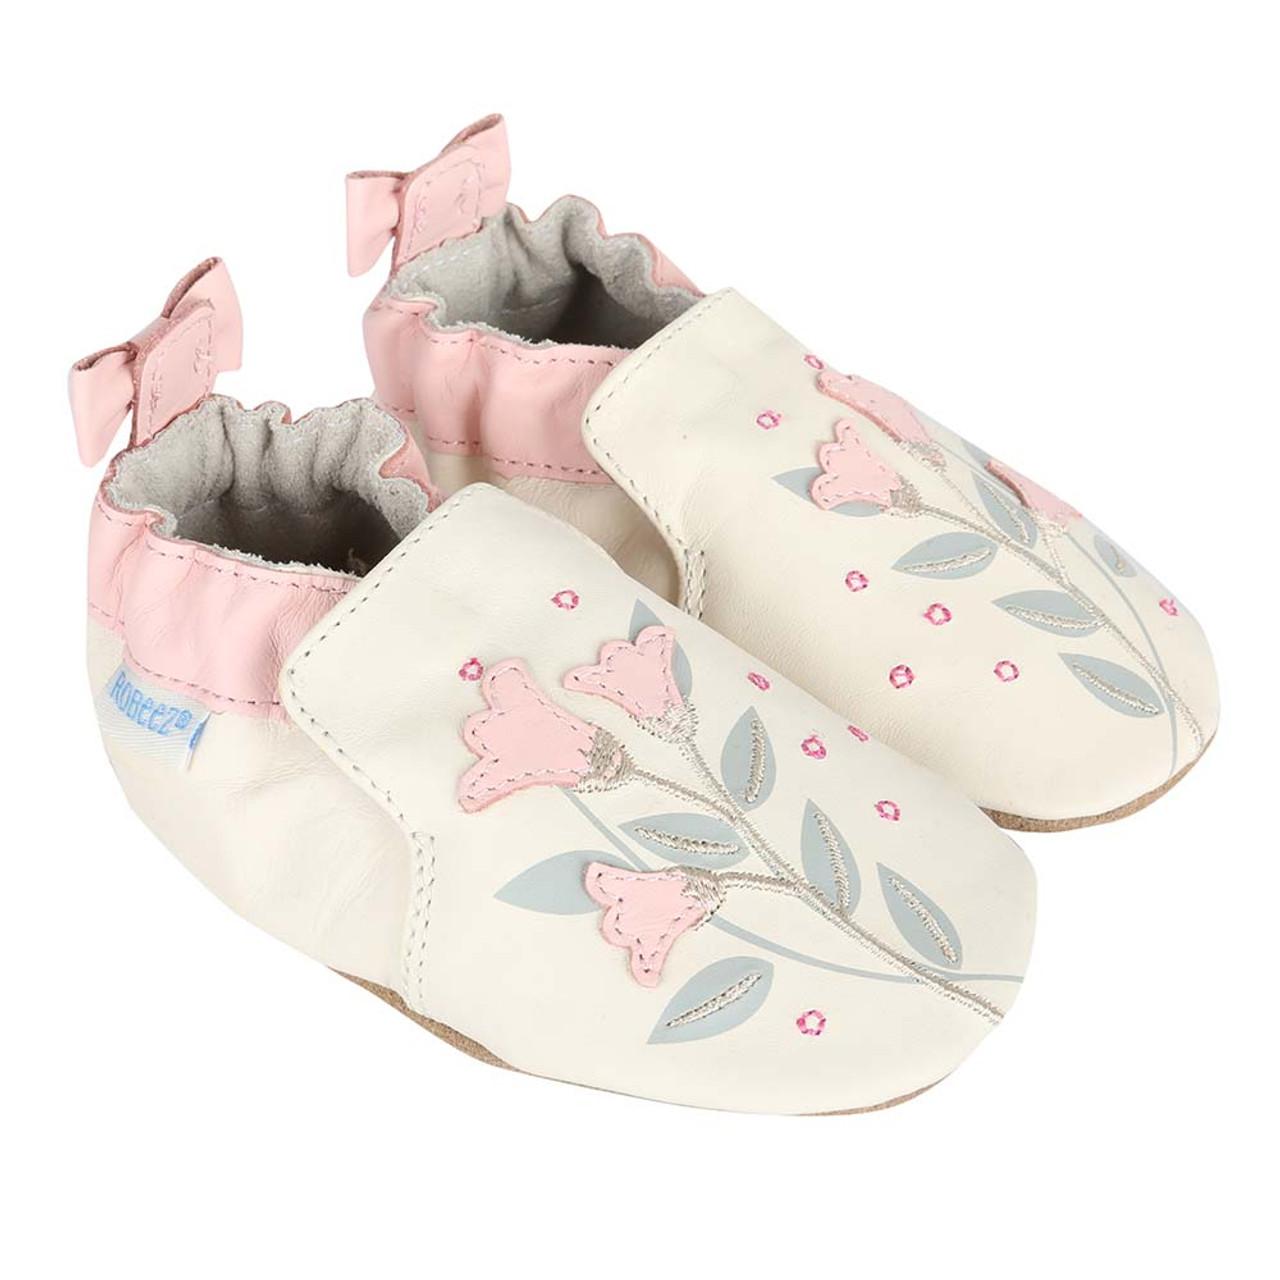 Rosealean Soft Soles Baby Shoes Robeez